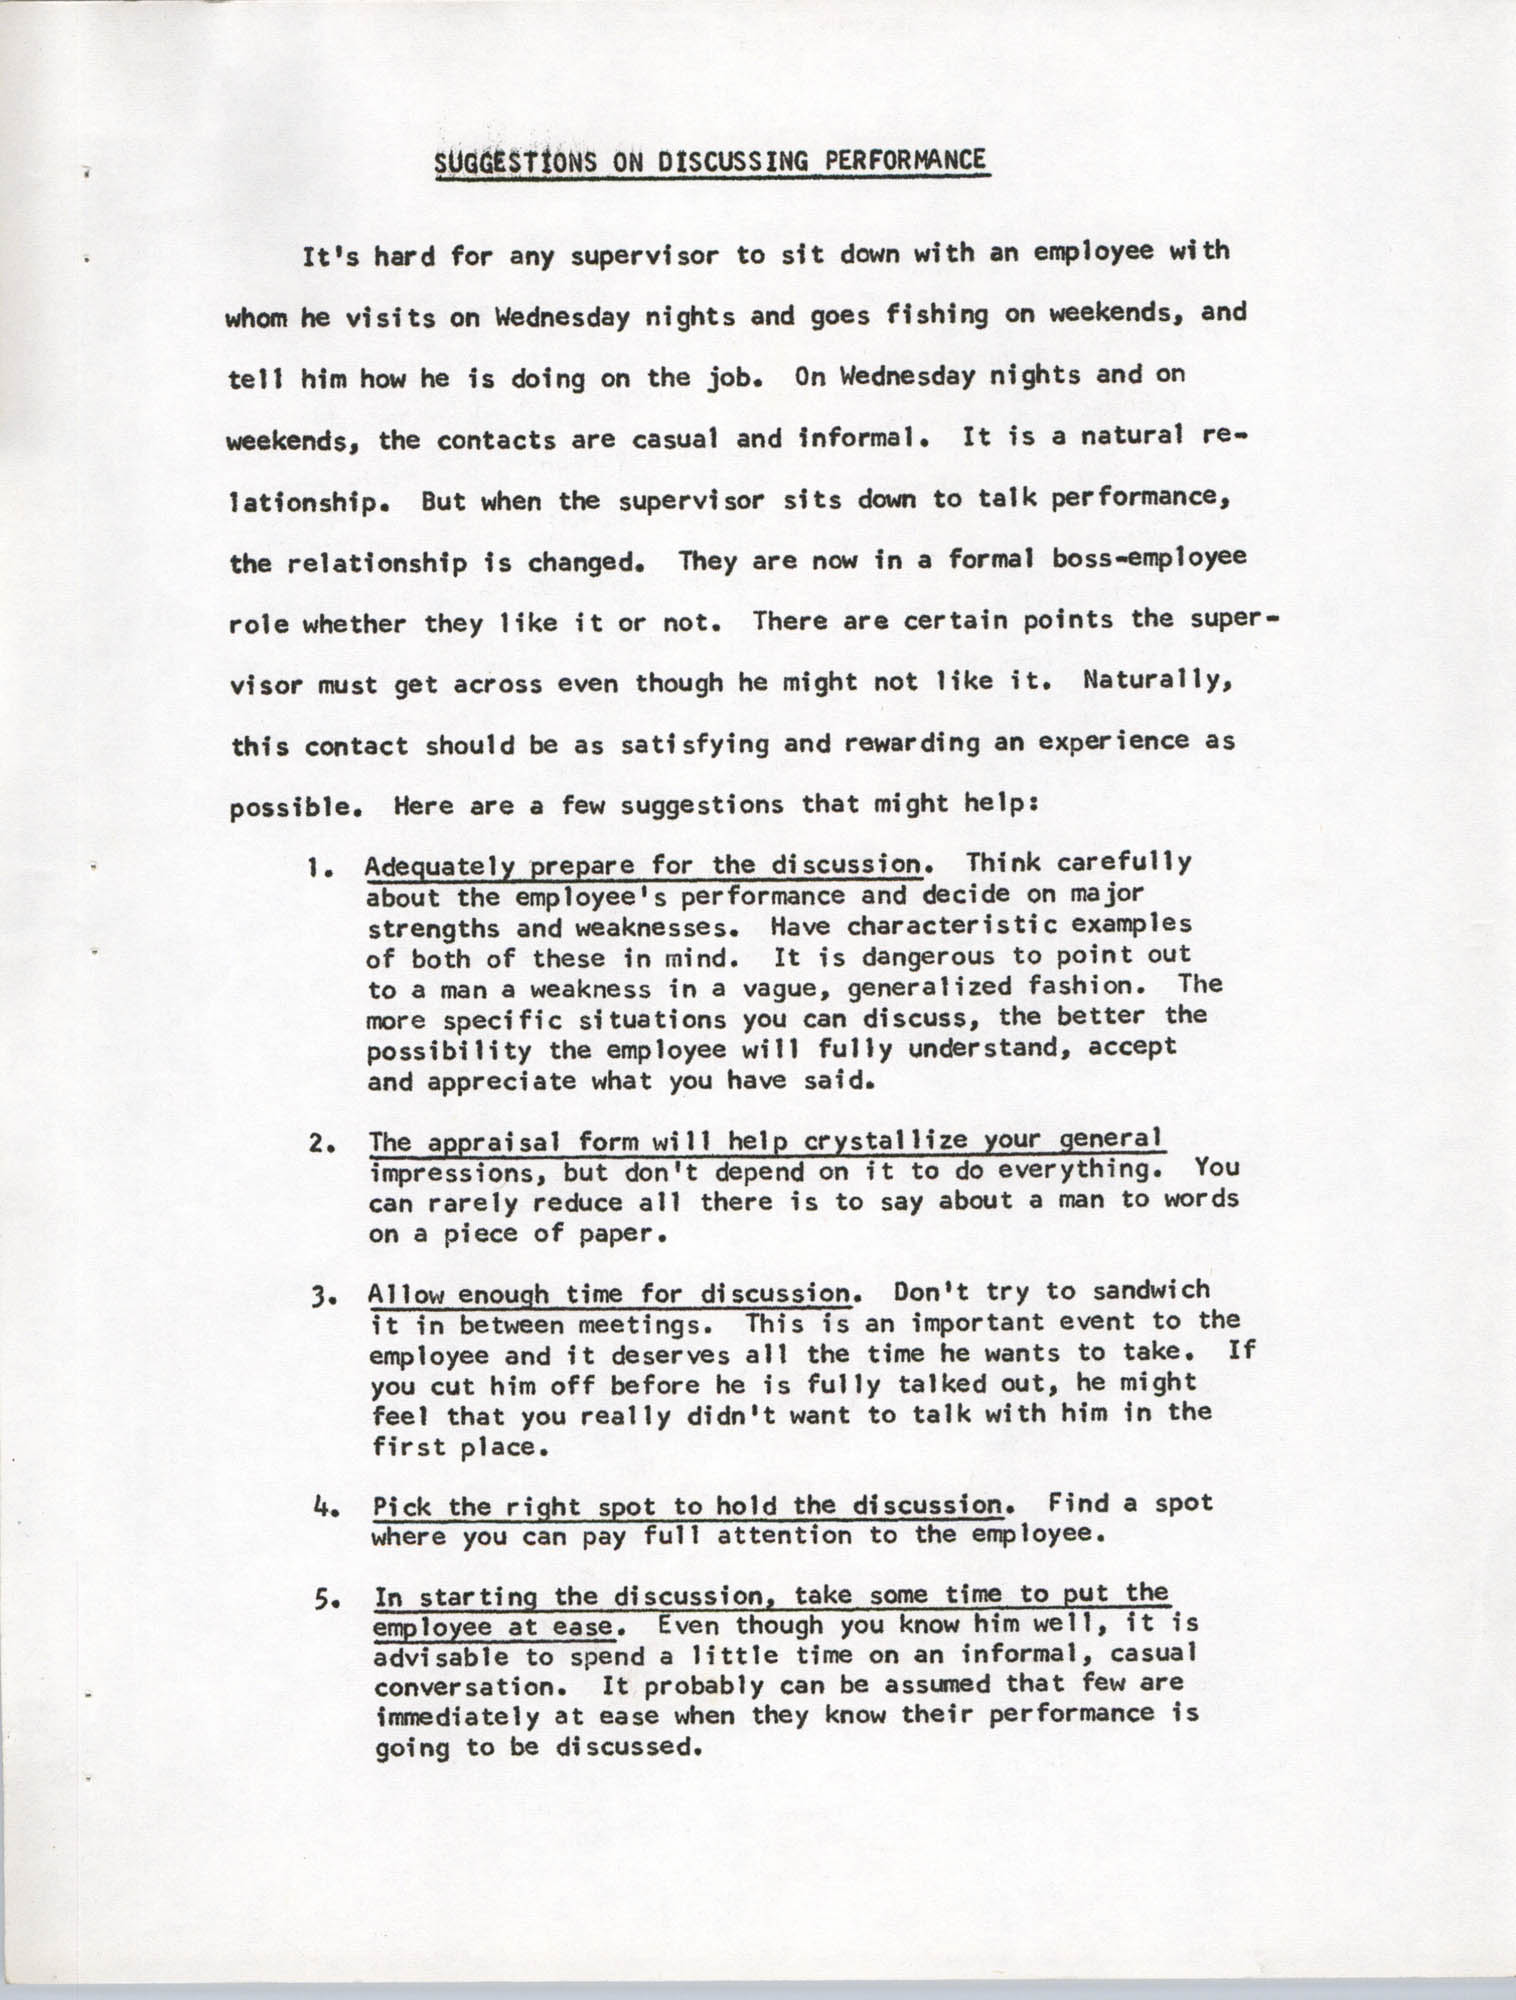 Supervisor Handbook, Selections, Page 1